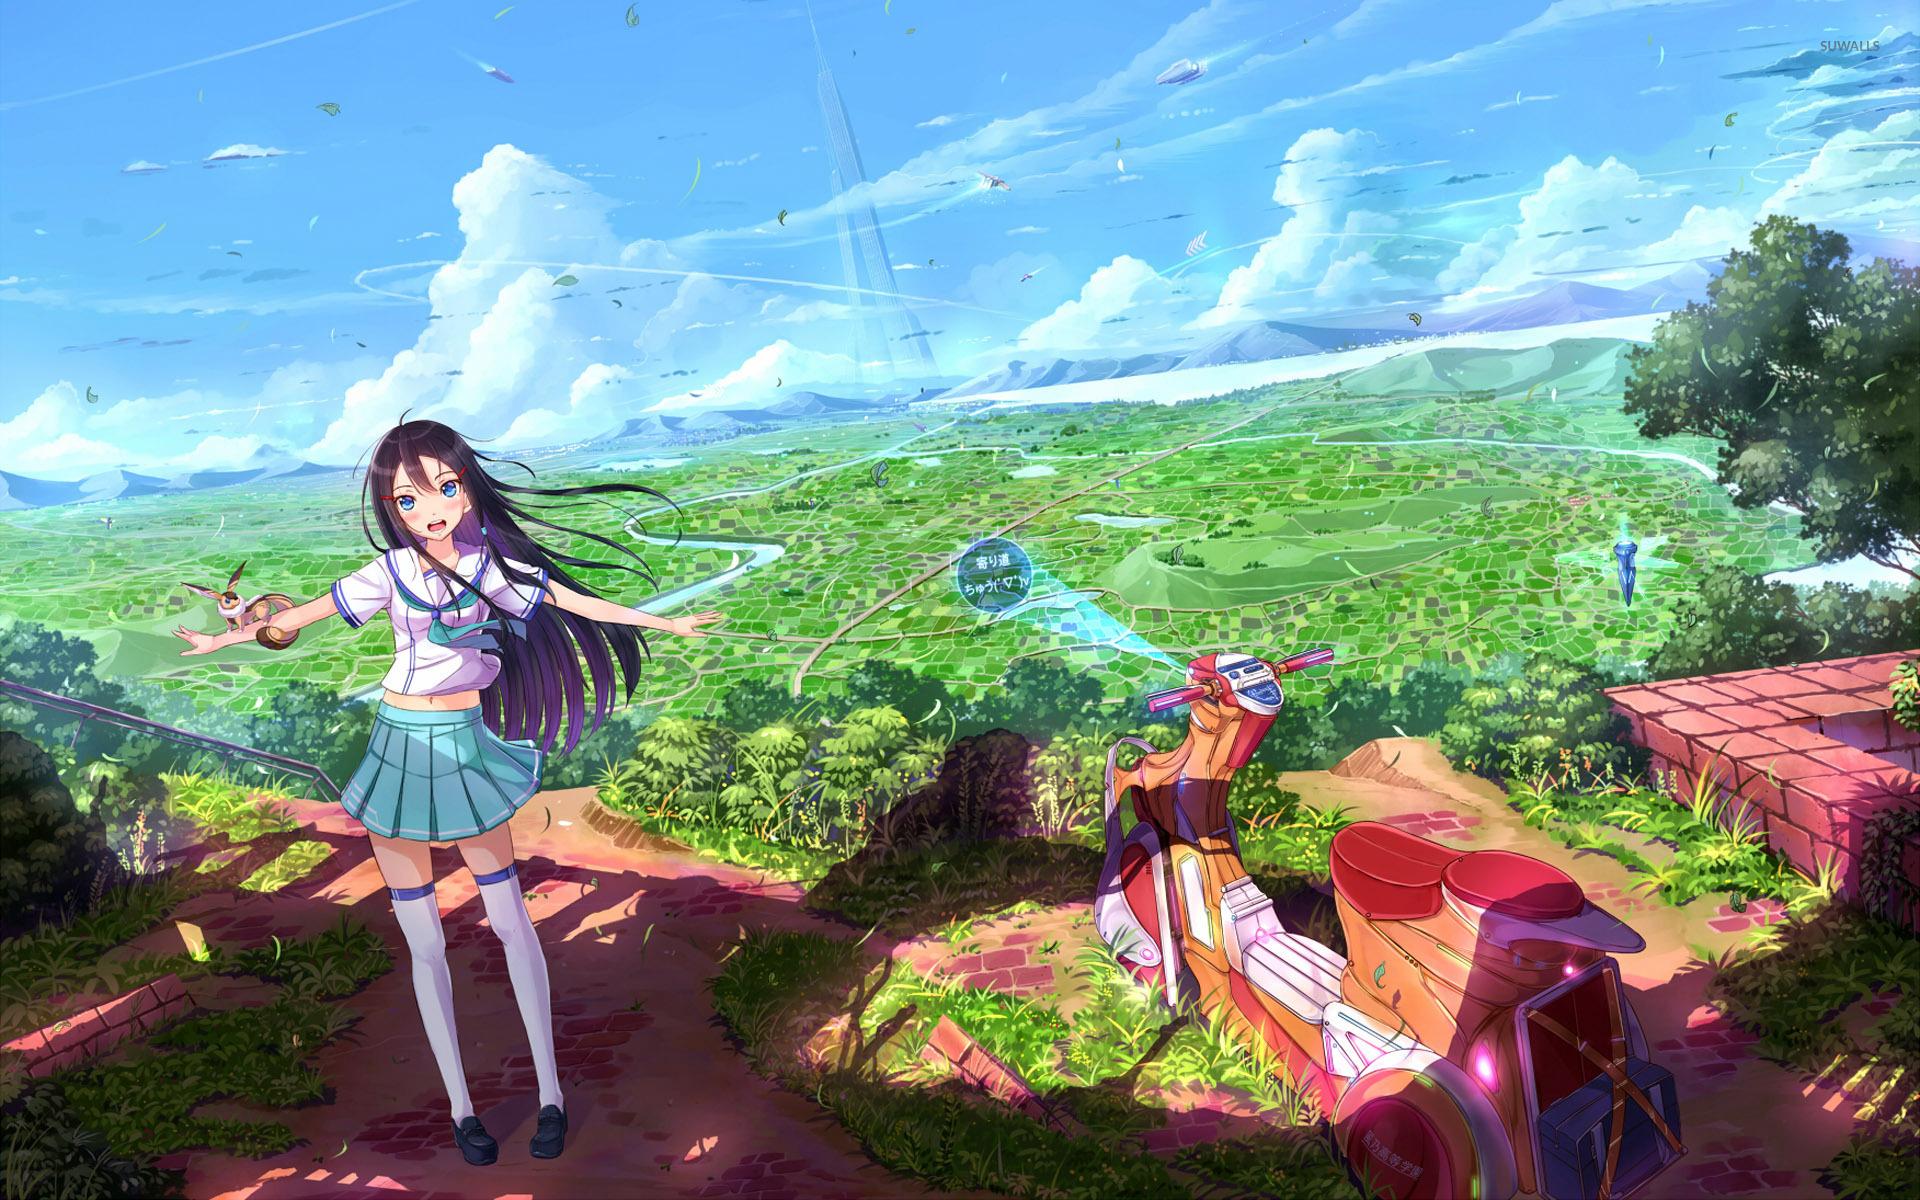 Dragon Ball Z Girls Wallpaper Schoolgirl With Her Scooter Wallpaper Anime Wallpapers